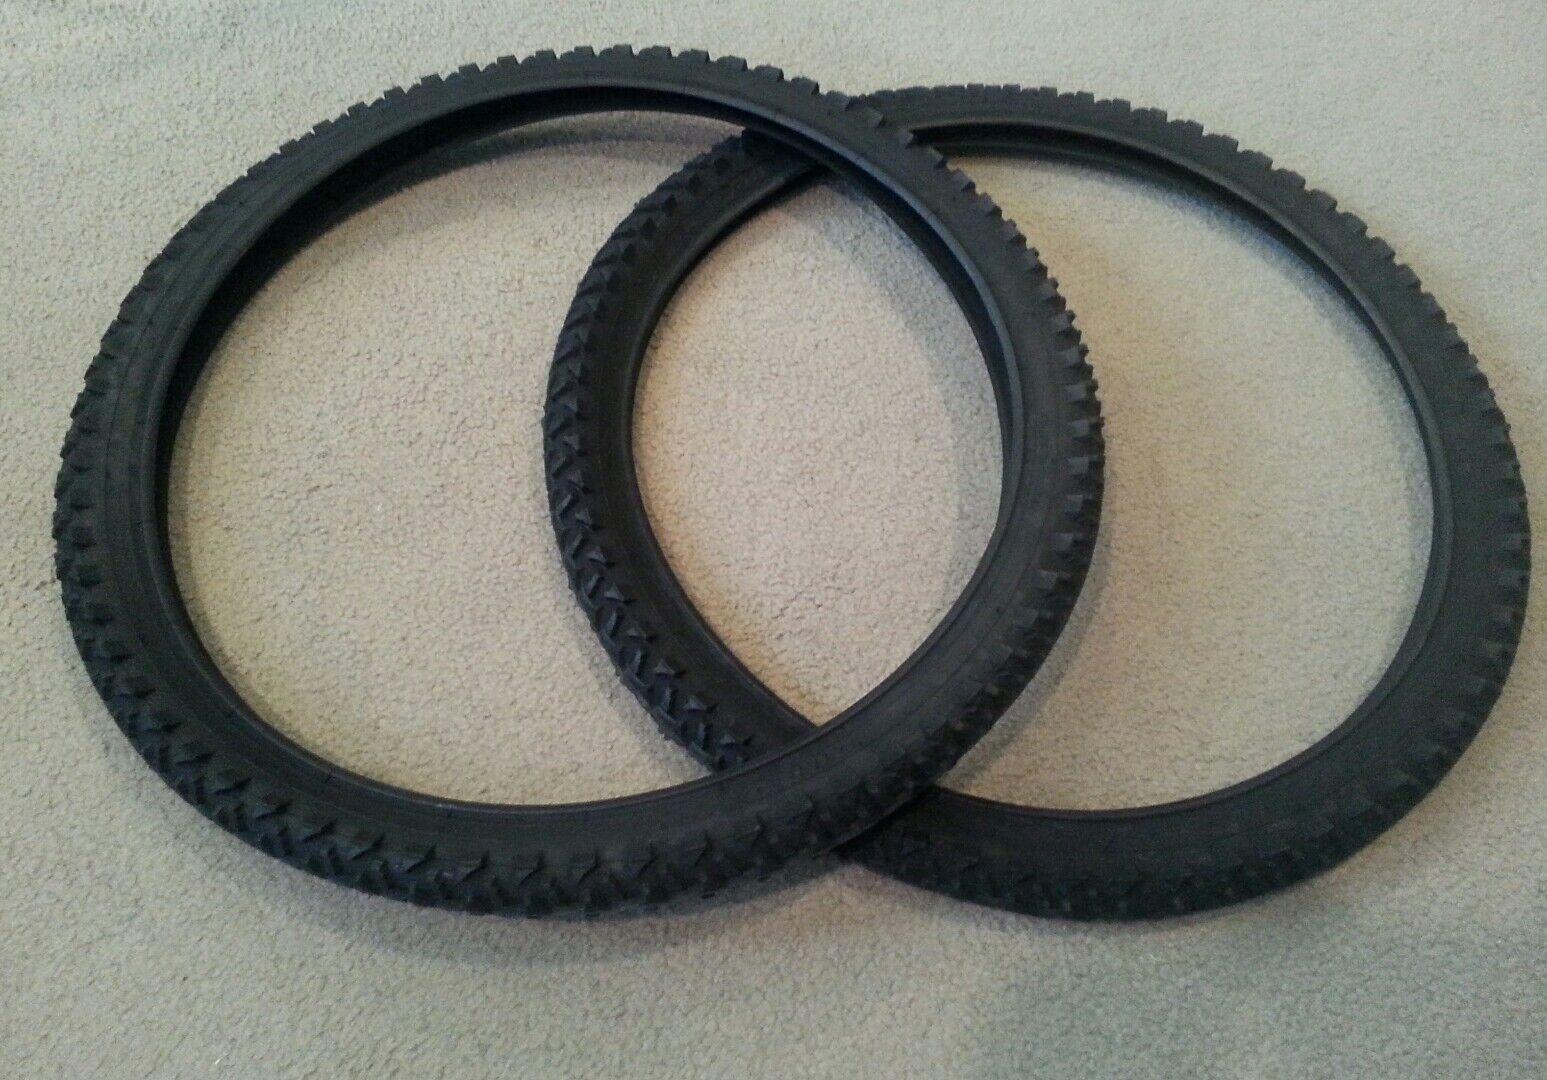 TWO(2) DURO 24X1.95(54-507)  BICYCLE TIRES  DIAMOND GRIP TREAD M.B  order now